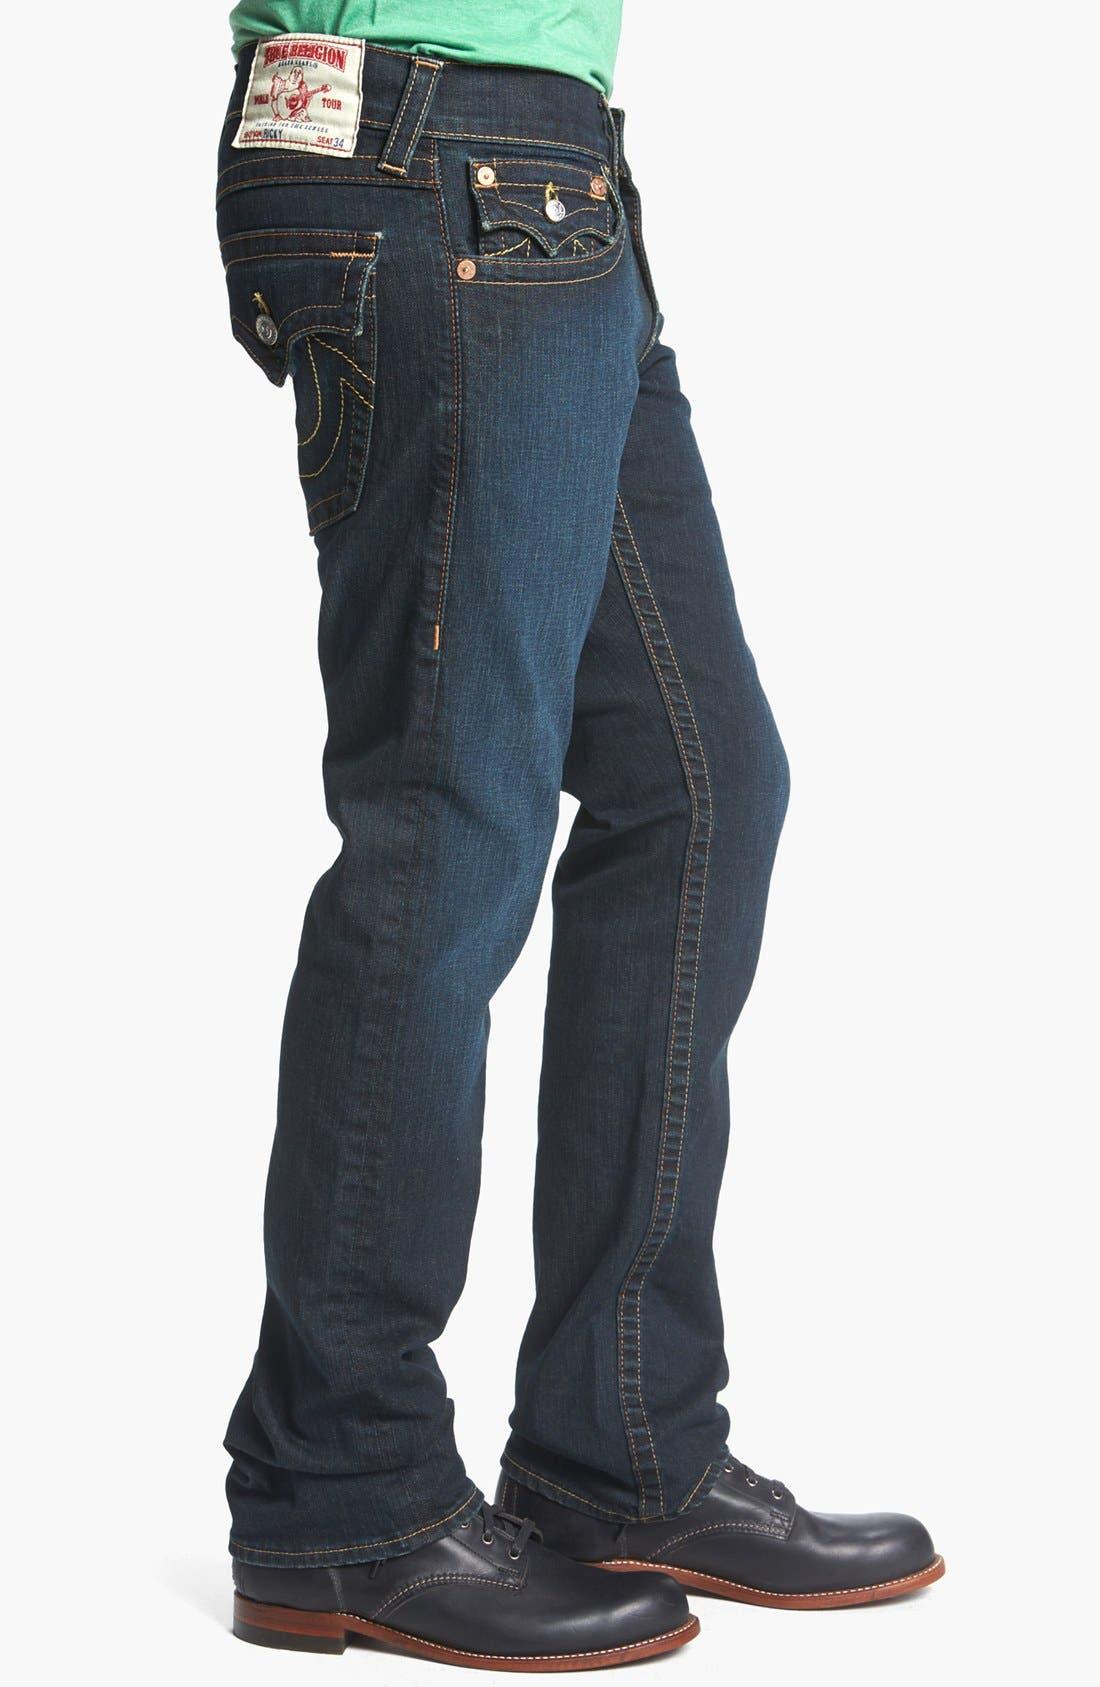 Alternate Image 3  - True Religion Brand Jeans 'Ricky' Straight Leg Jeans (Jackknife)